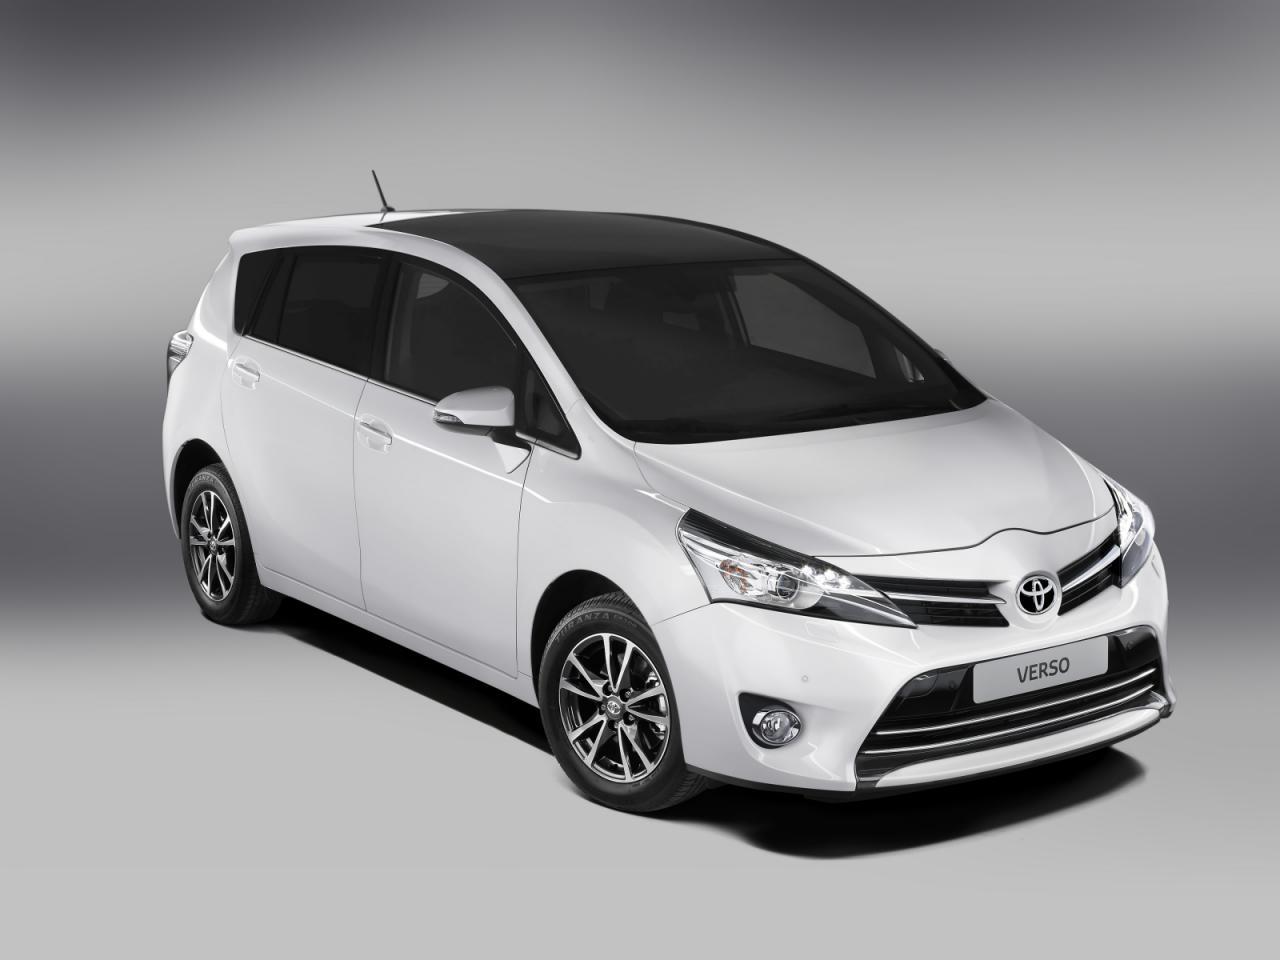 [Resim: Toyota+Verso+1.jpg]